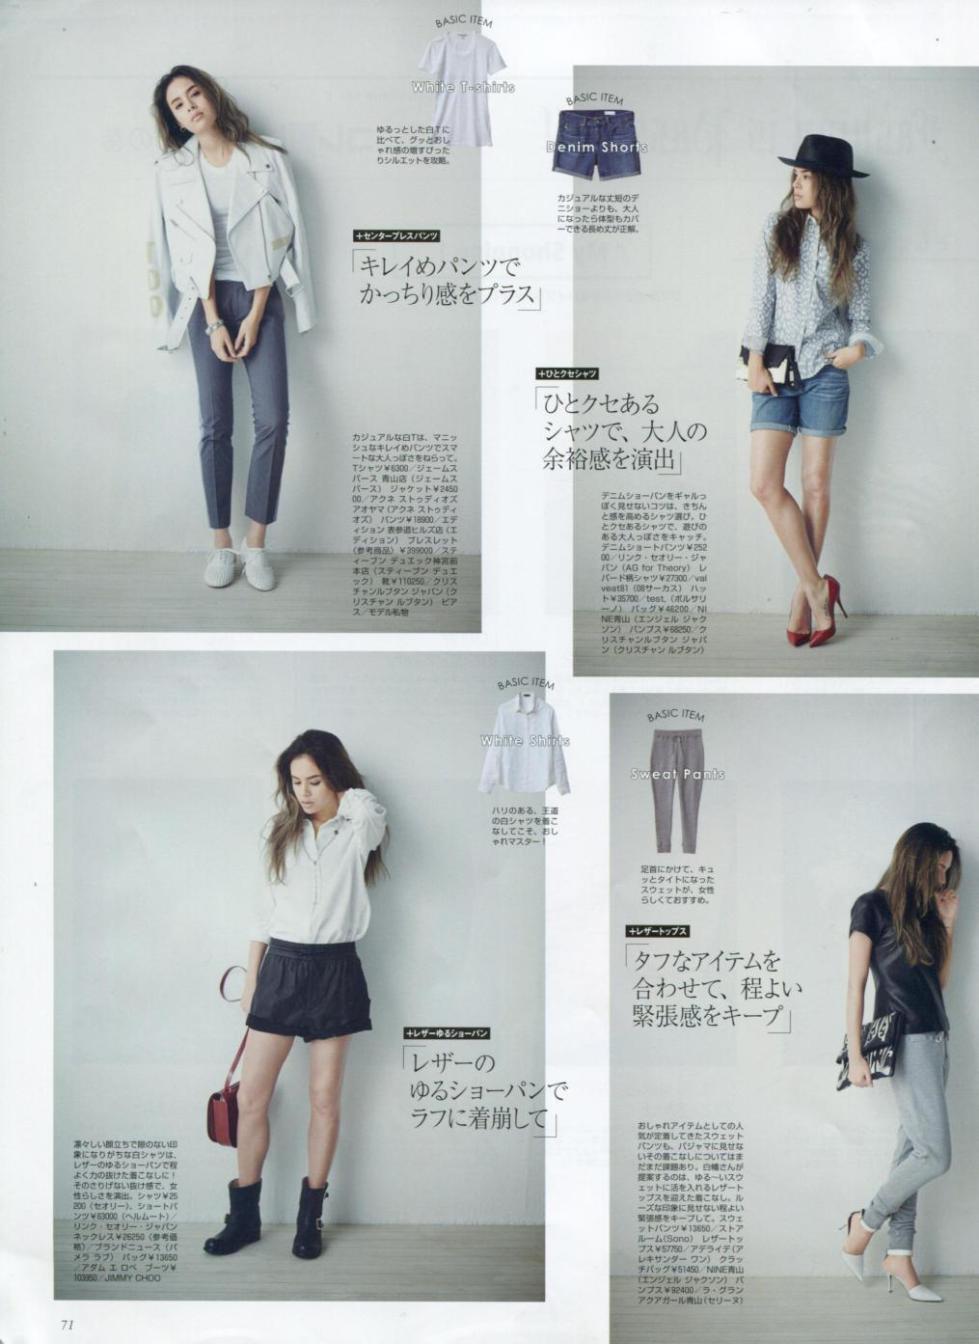 Glamorous JAP 2013-5-1 pag 71